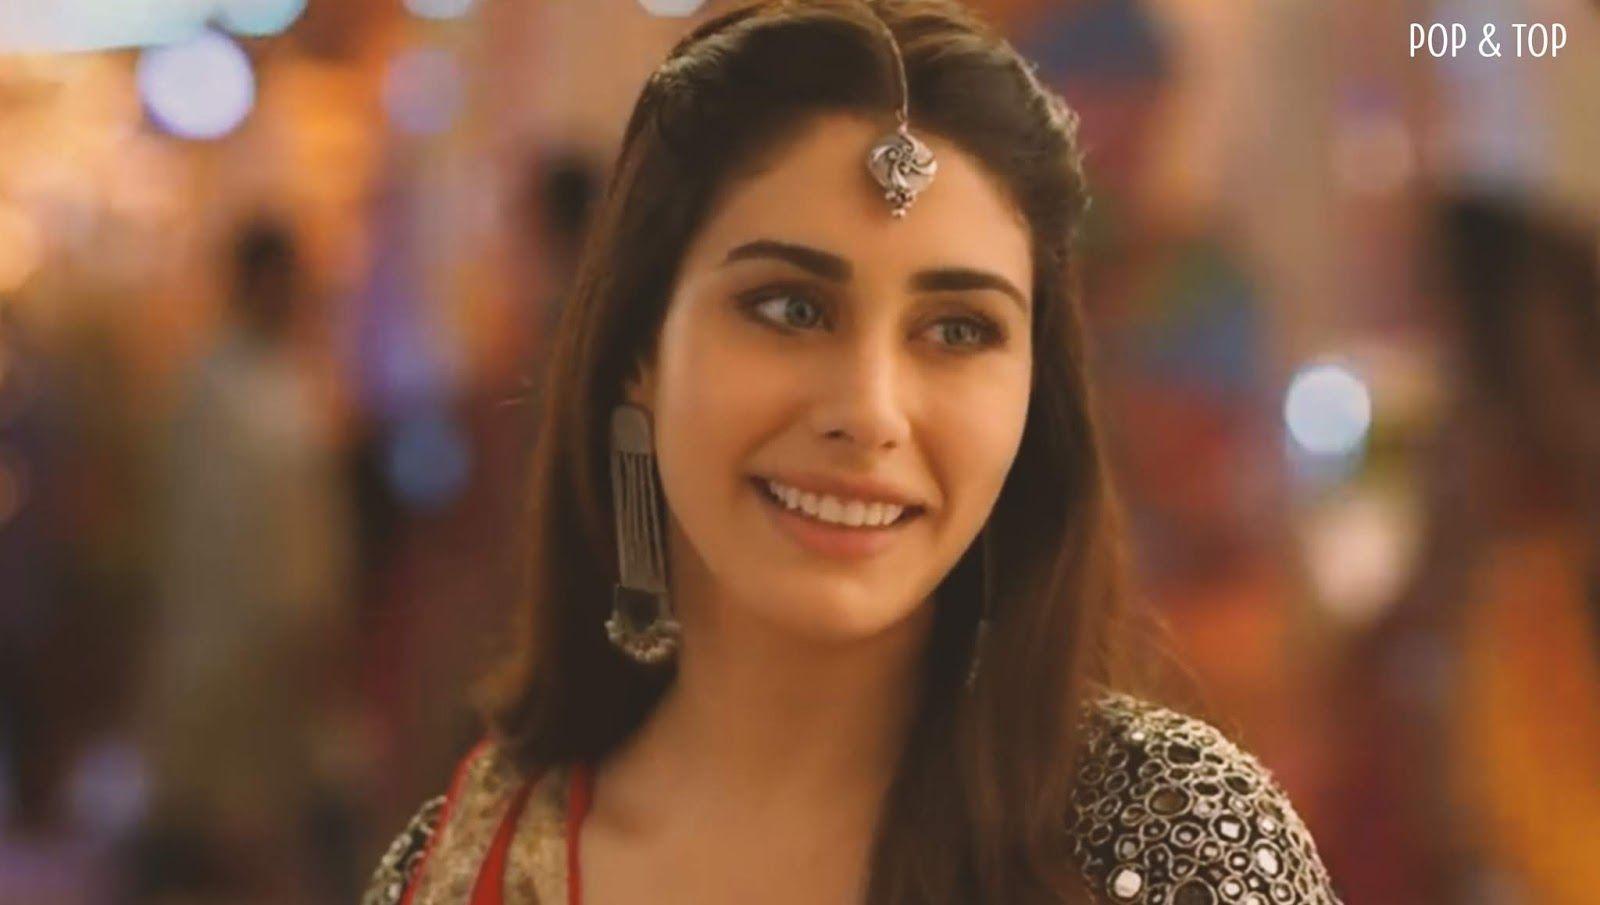 Hot Bollywood Actress Pics , Images , Wallpaper in HD💋